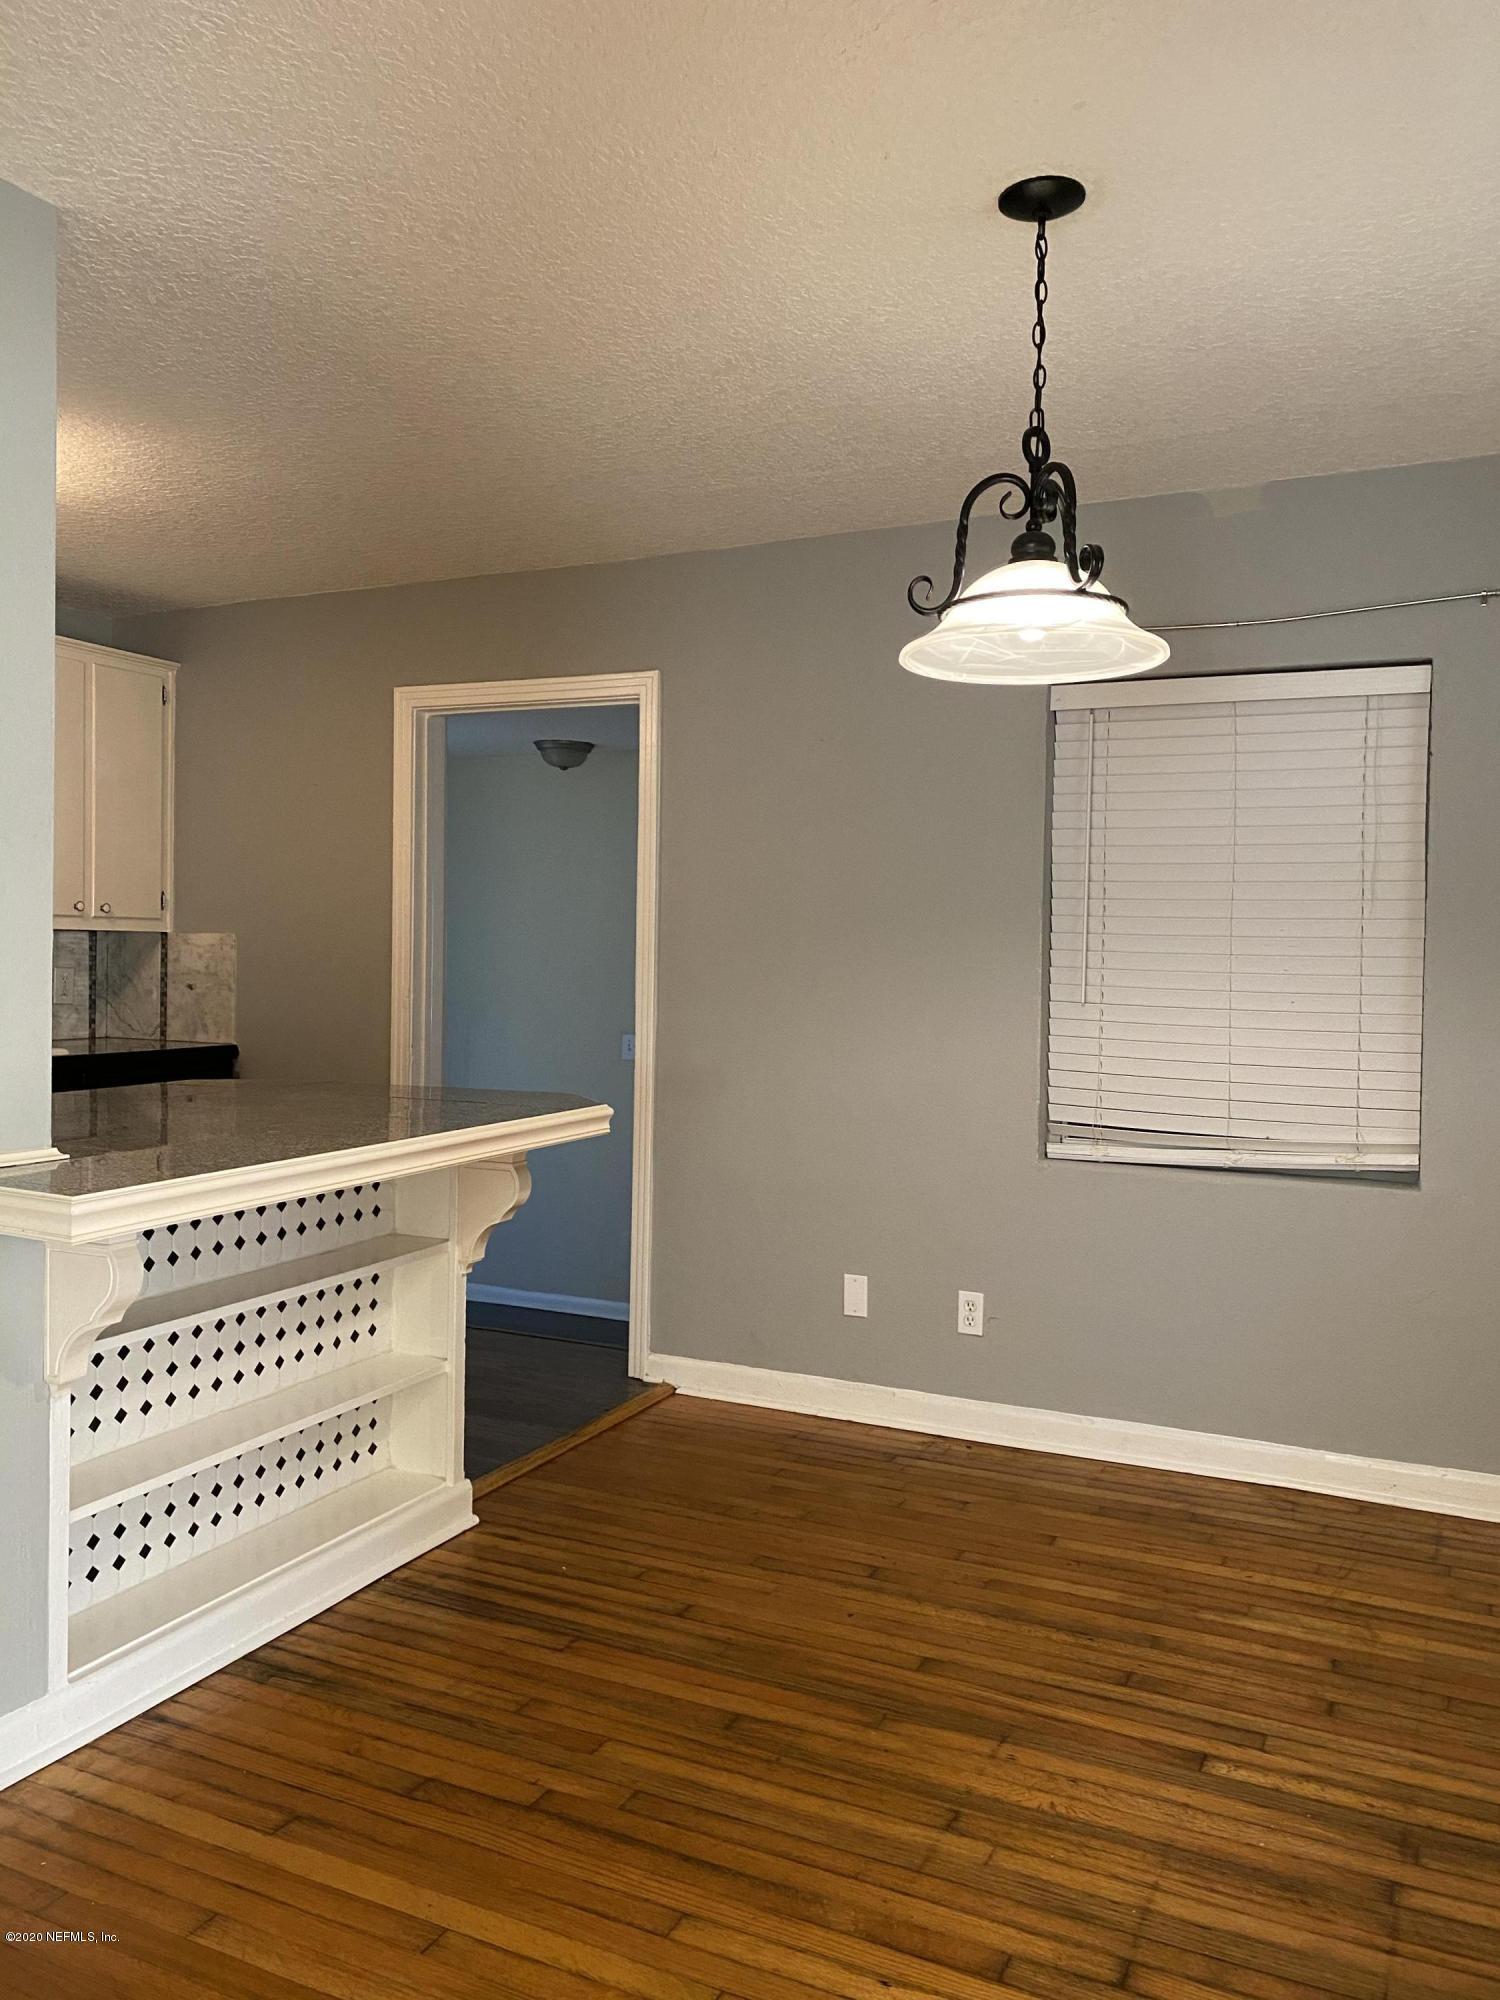 6317 SAGE, JACKSONVILLE, FLORIDA 32210, 3 Bedrooms Bedrooms, ,1 BathroomBathrooms,Residential,For sale,SAGE,1082838